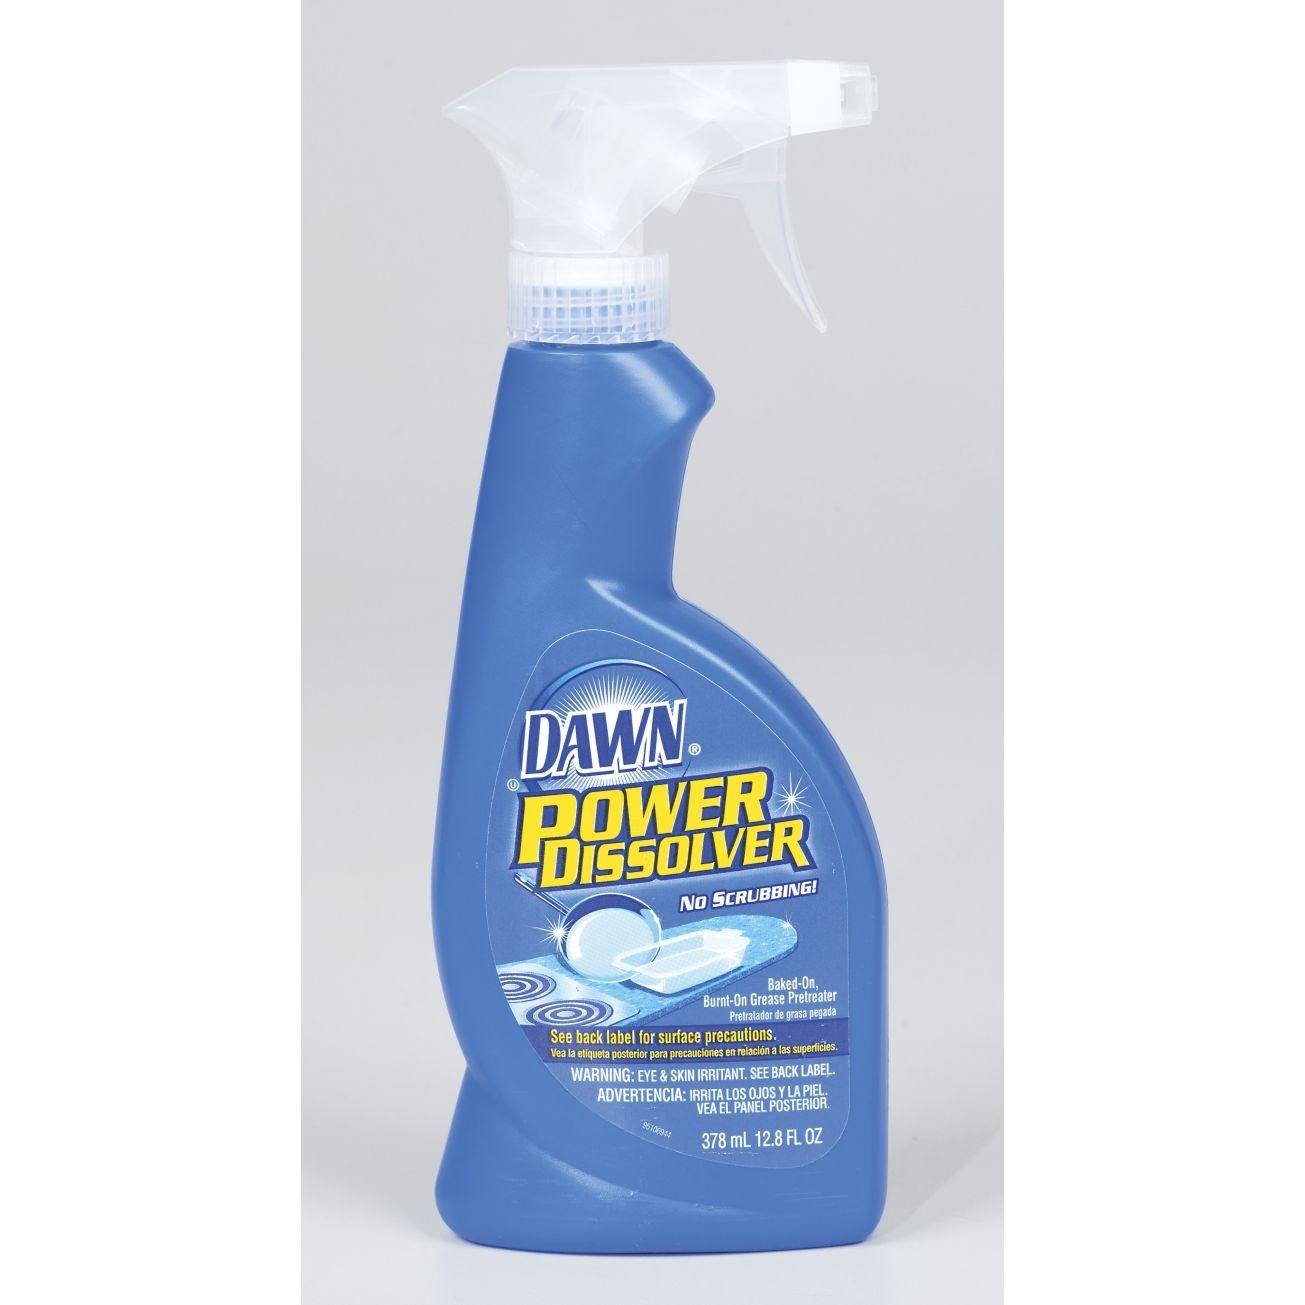 dawn power dissolver 00632 10 pack dishwashing soap ace